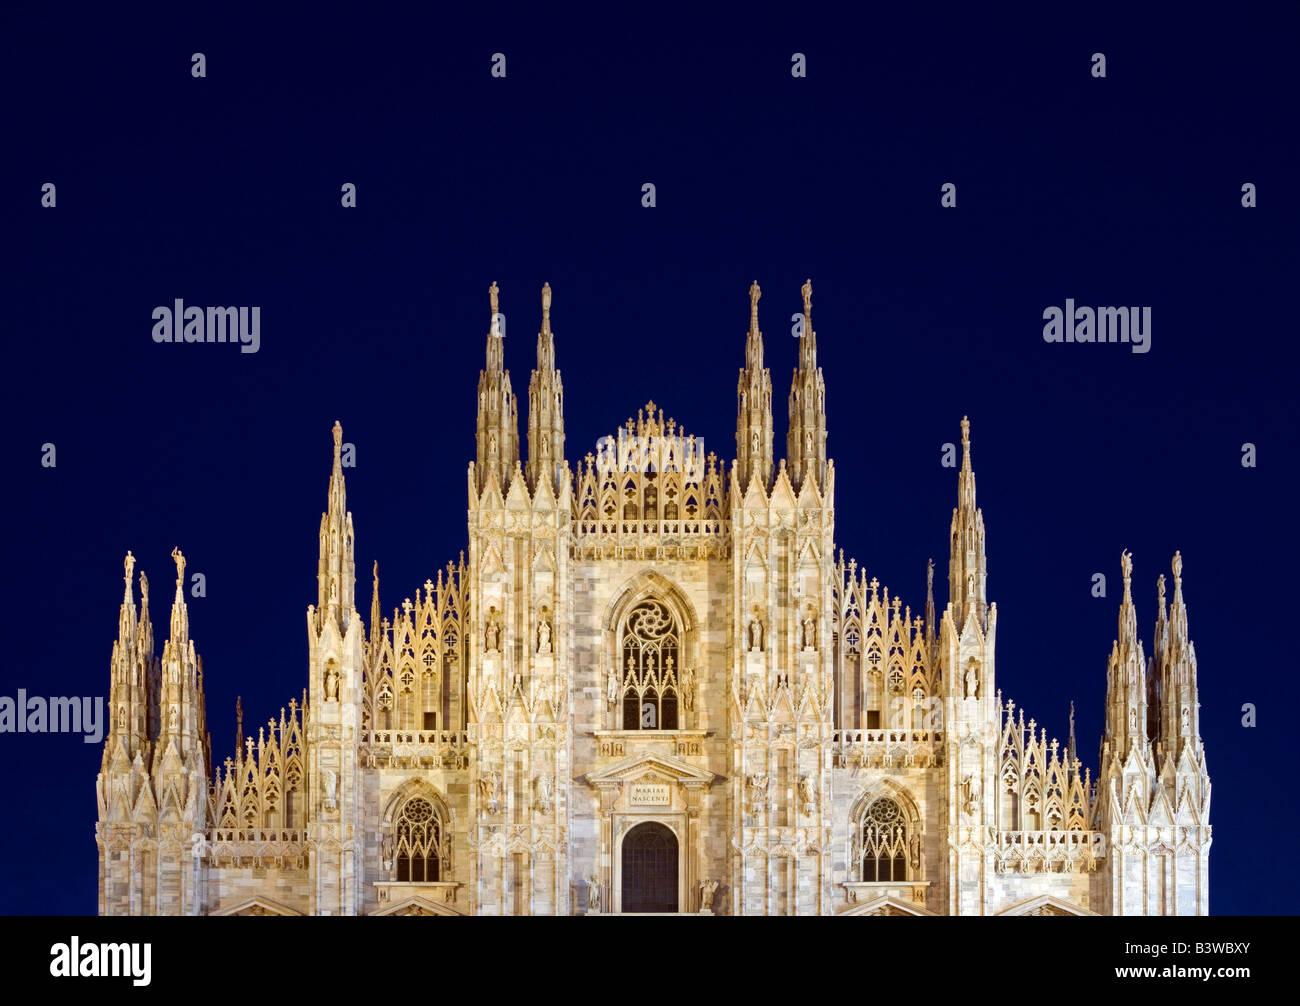 Duomo Di Milano. Milan, Italy. - Stock Image